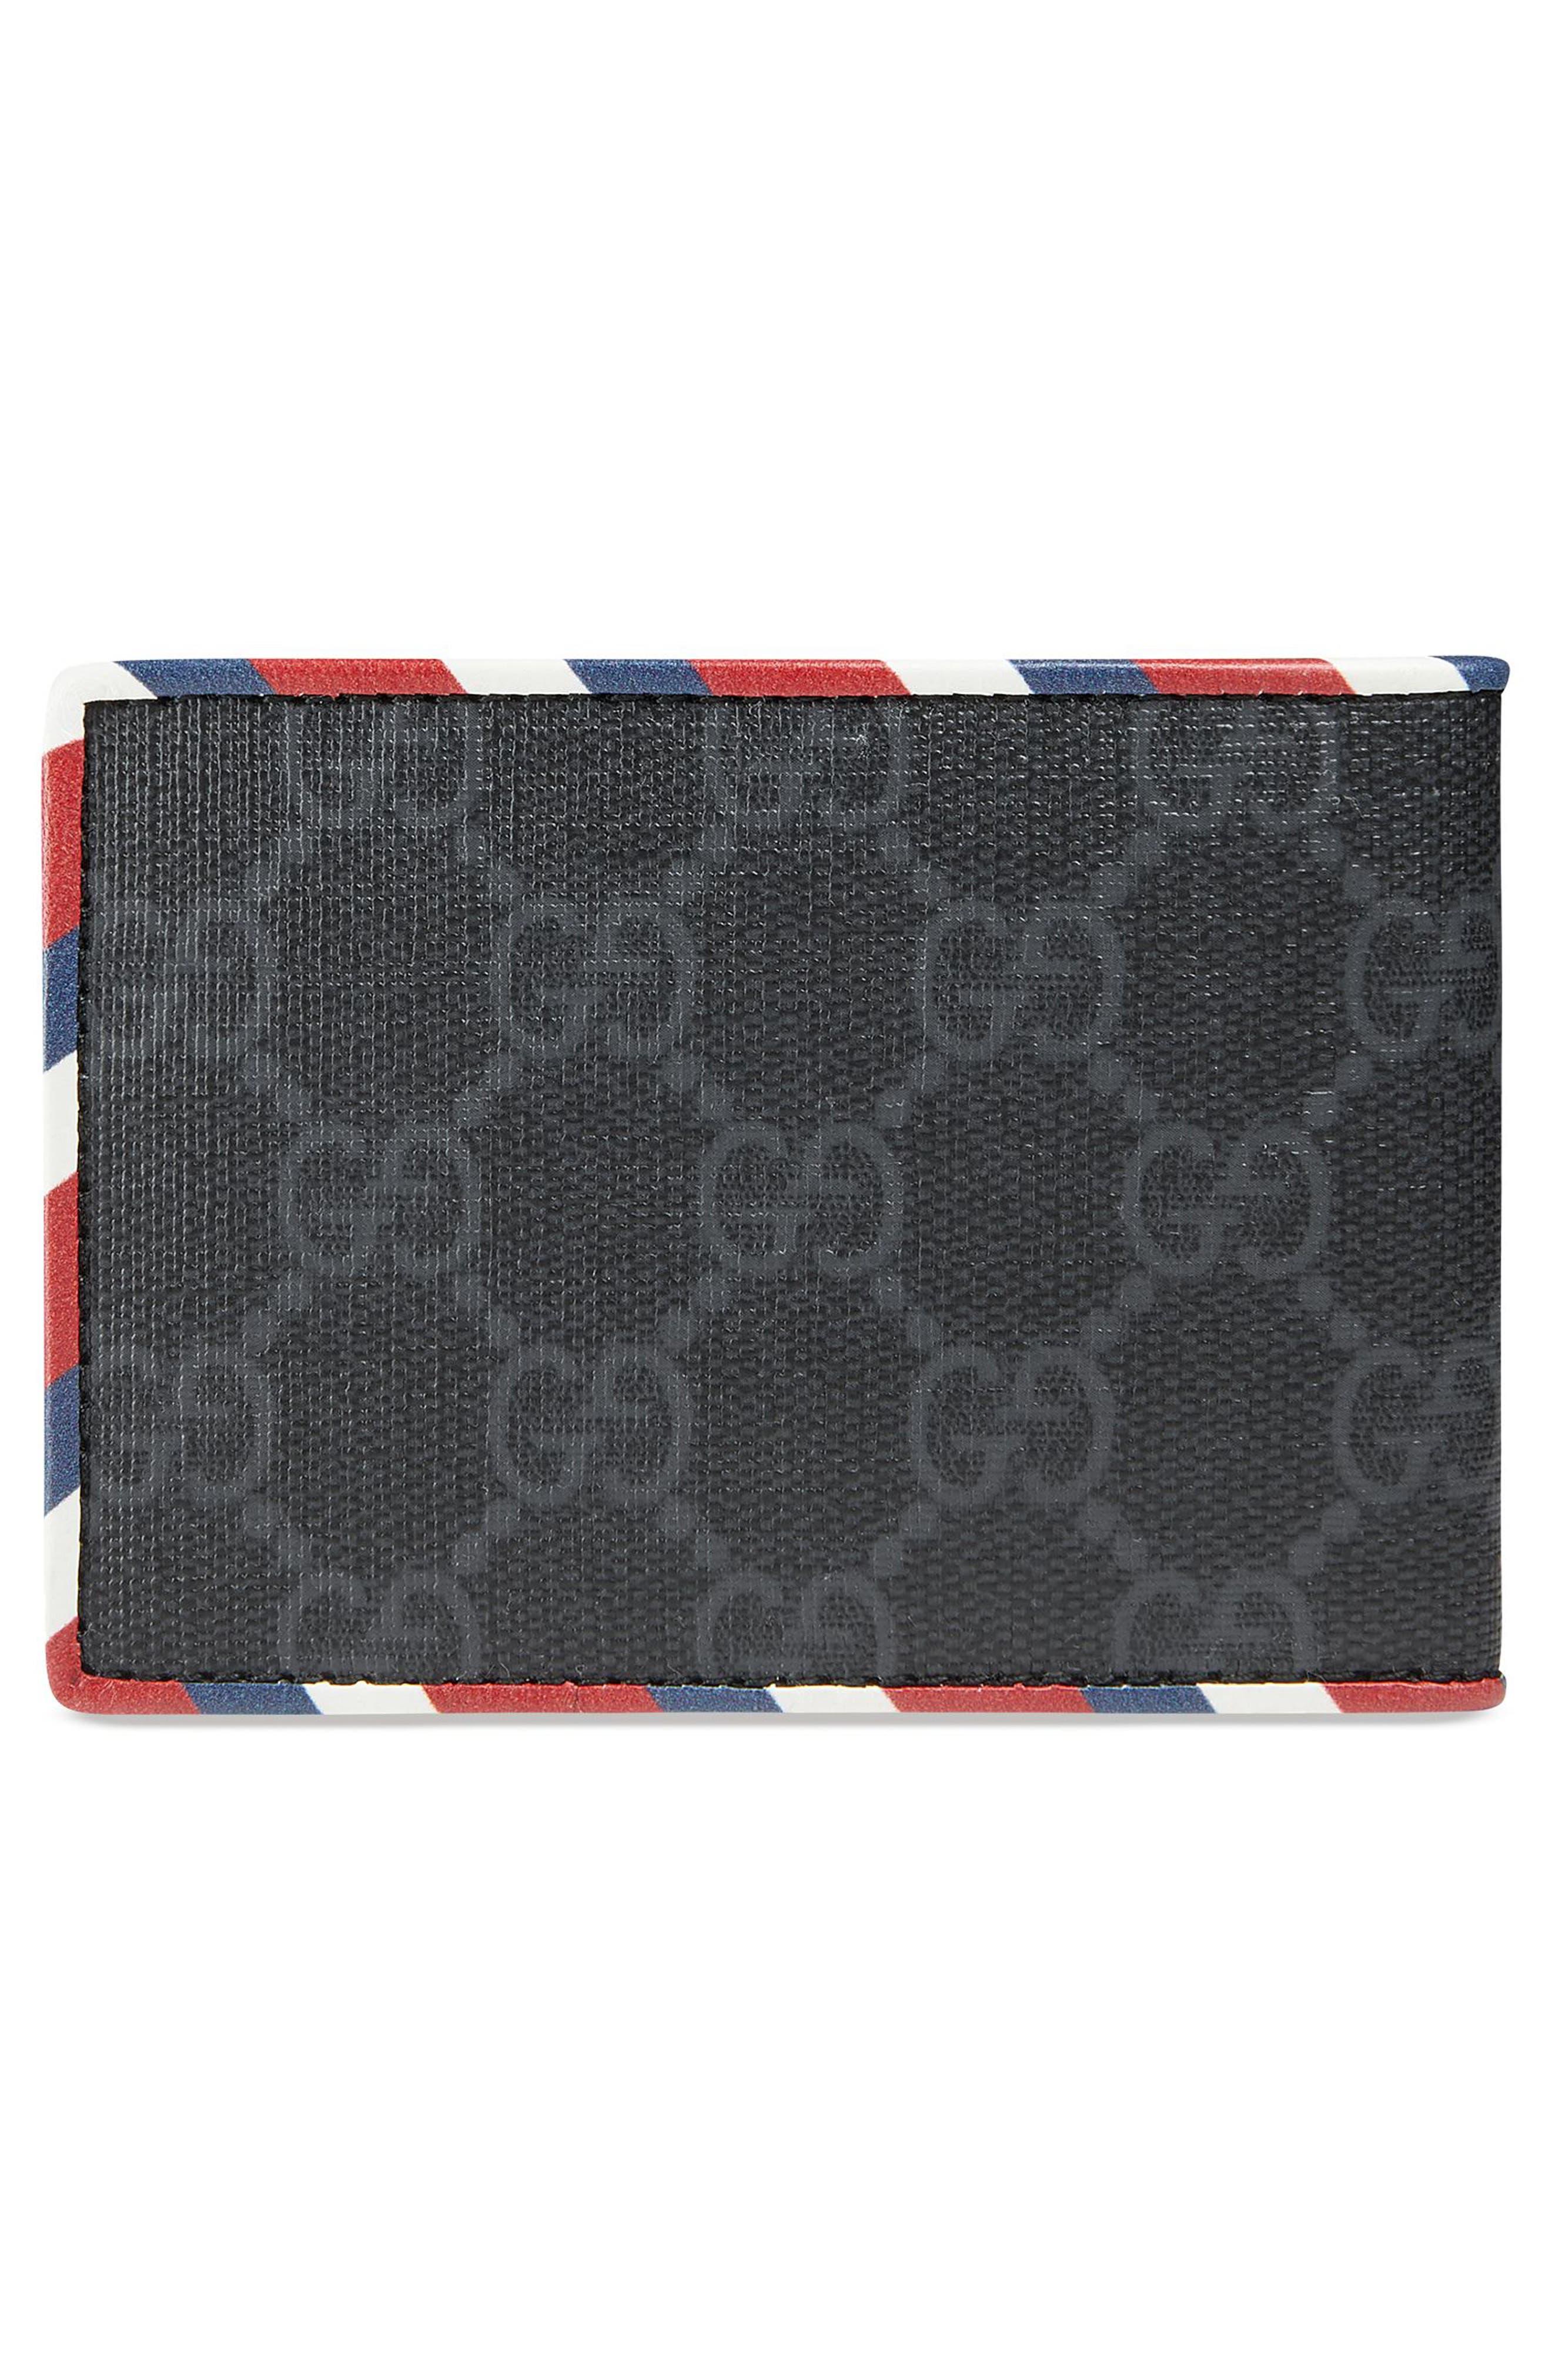 GG Supreme Patch Wallet,                             Alternate thumbnail 3, color,                             BLACK